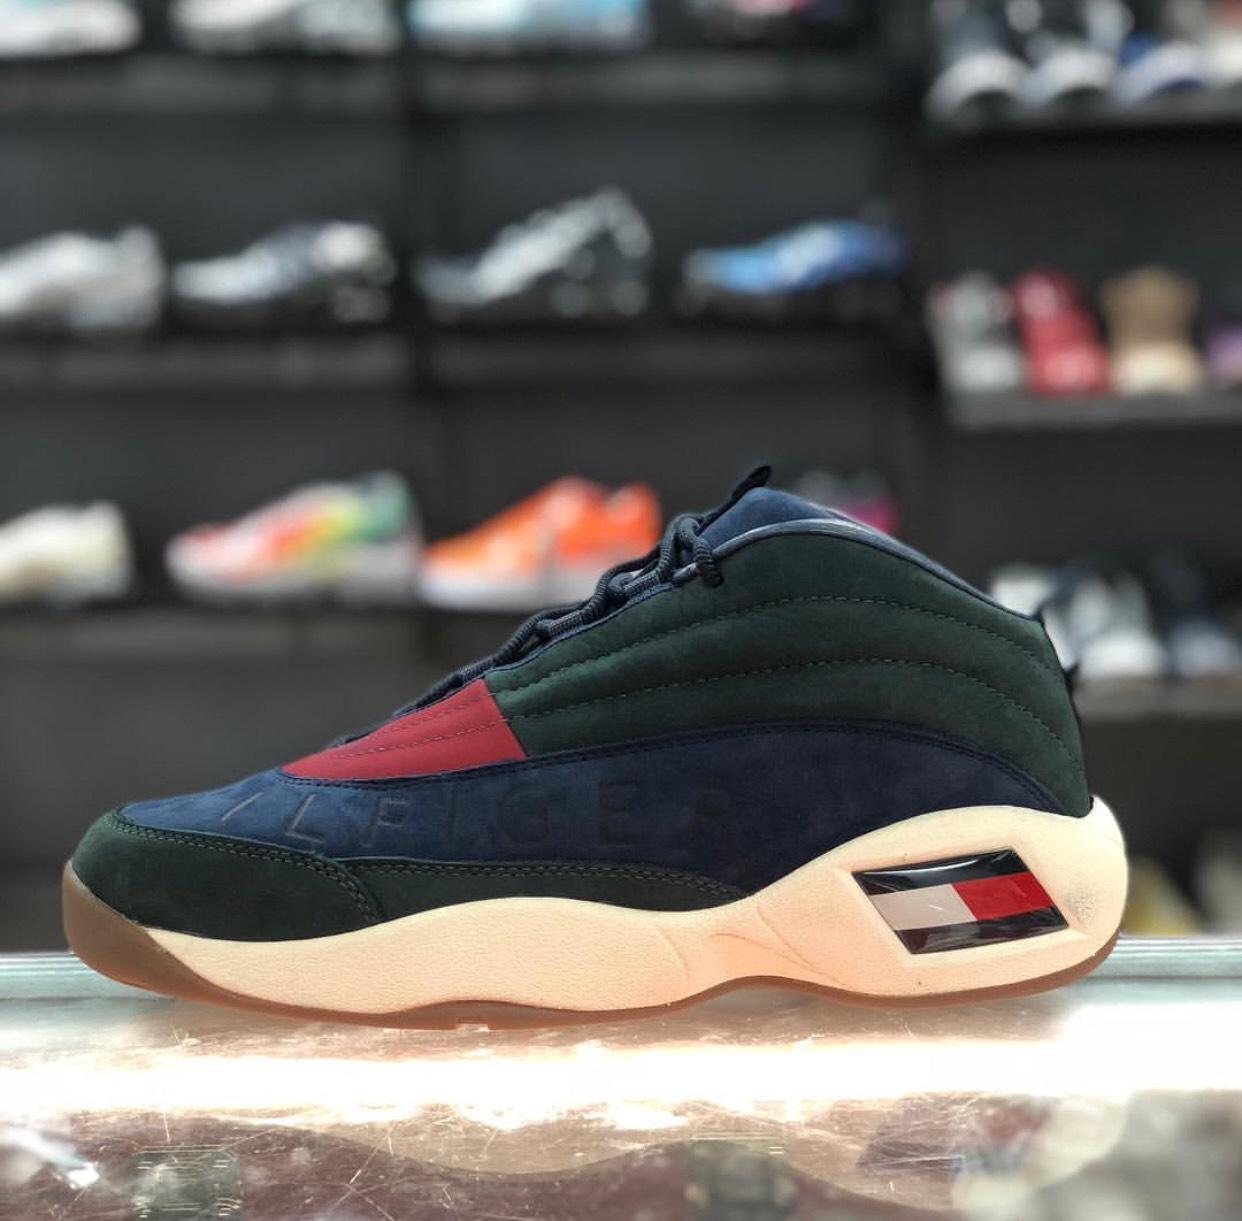 motivo Cayo préstamo  Tommy Hilfiger Kith X Tommy Hilfiger Lux Basketball Sneaker Forest Green /  Navy | Grailed